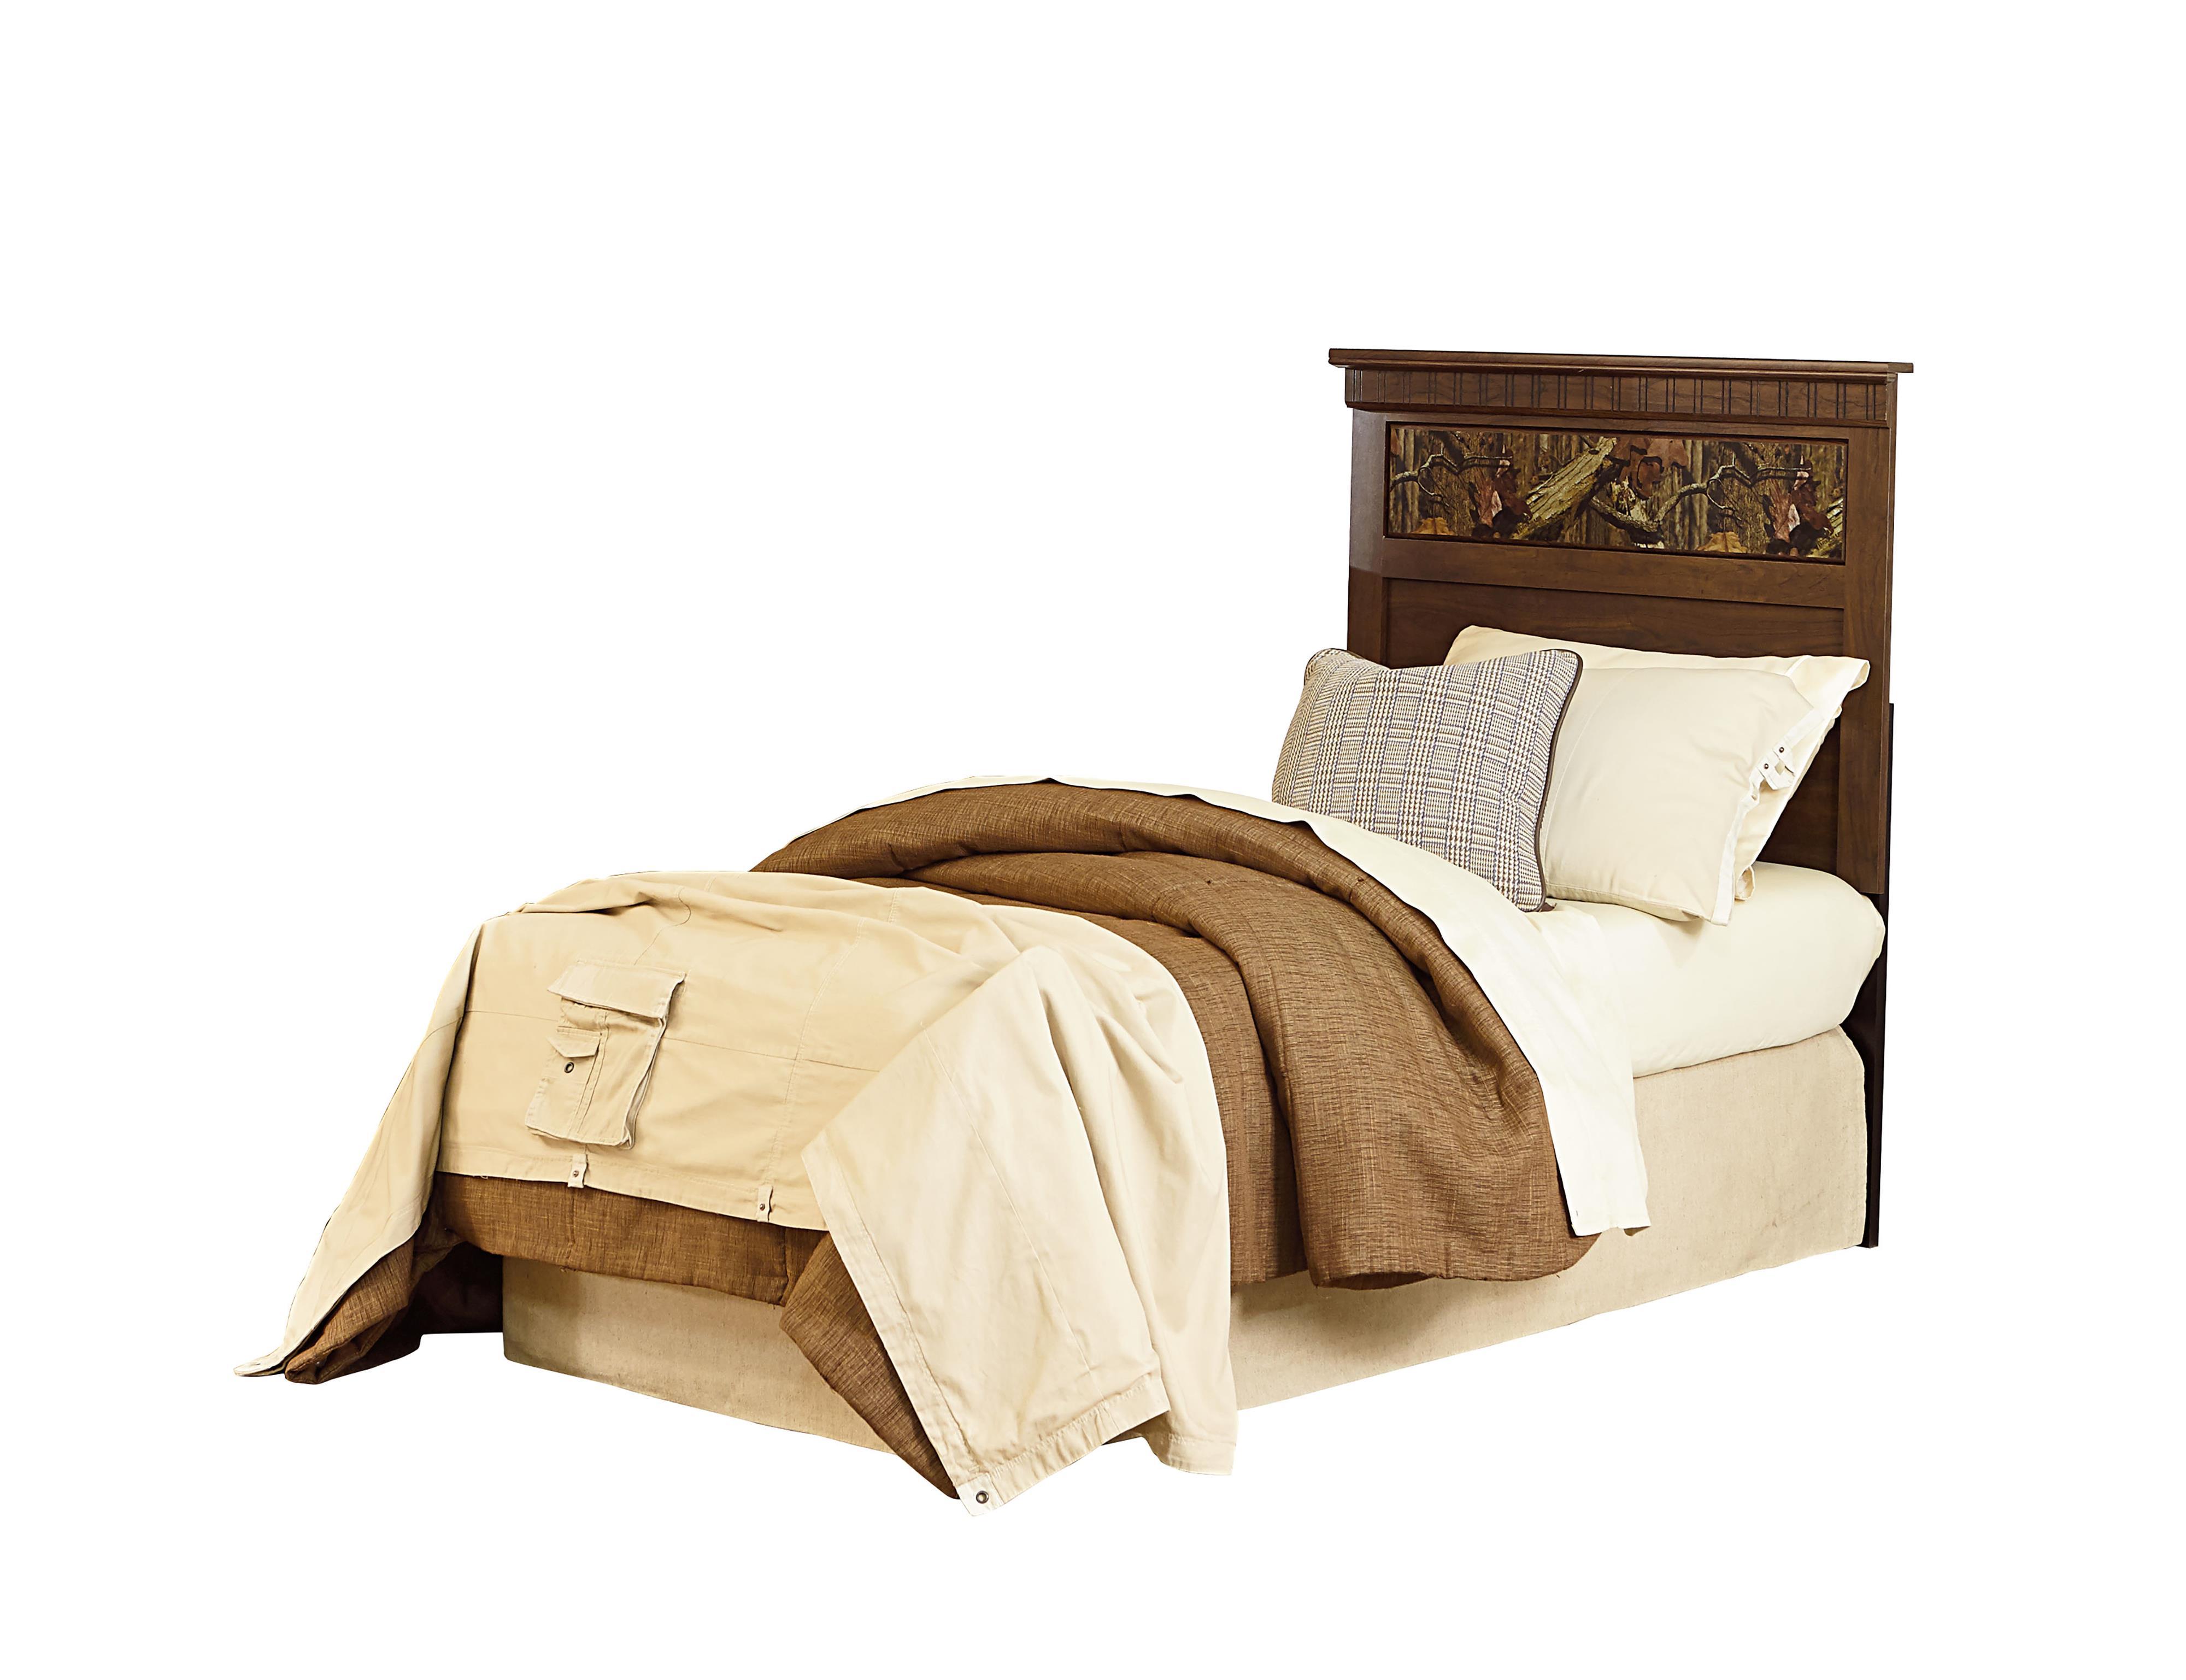 Standard Furniture Solitude Paneled Headboard                         - Item Number: 52953